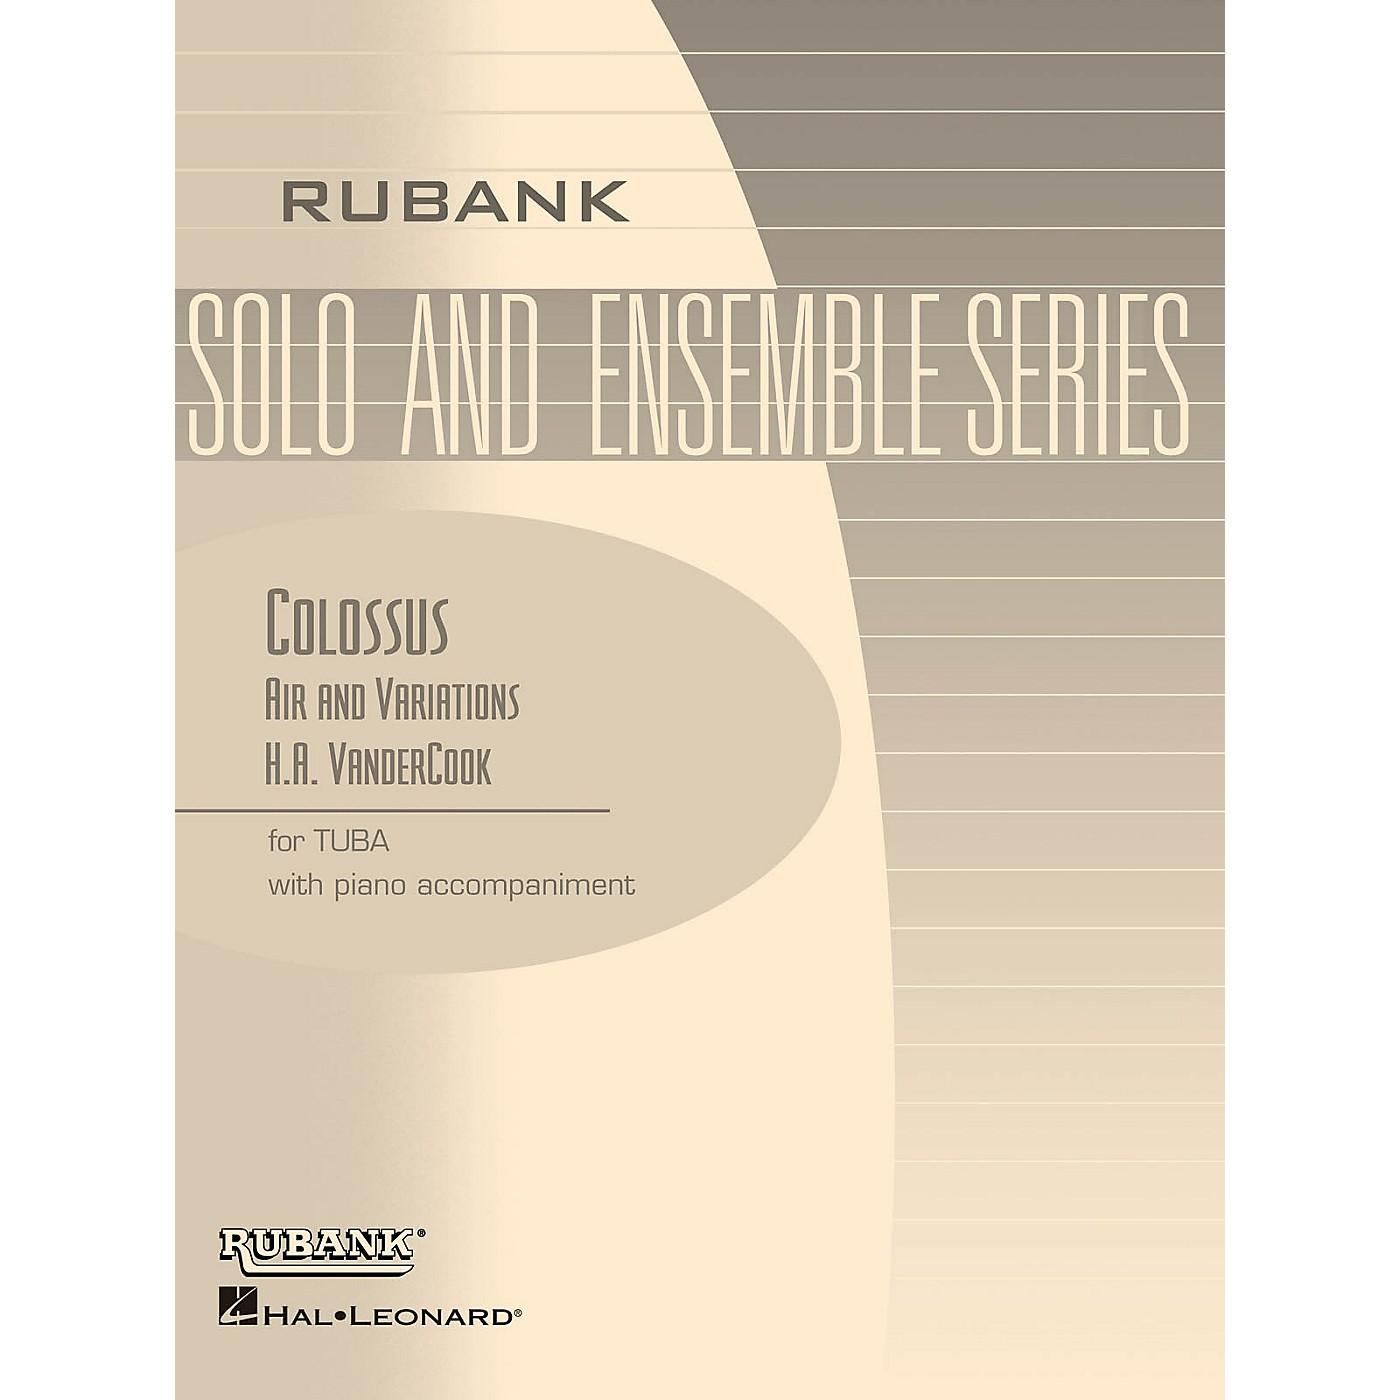 Rubank Publications Colossus - Air and Variations Rubank Solo/Ensemble Sheet Series Softcover thumbnail